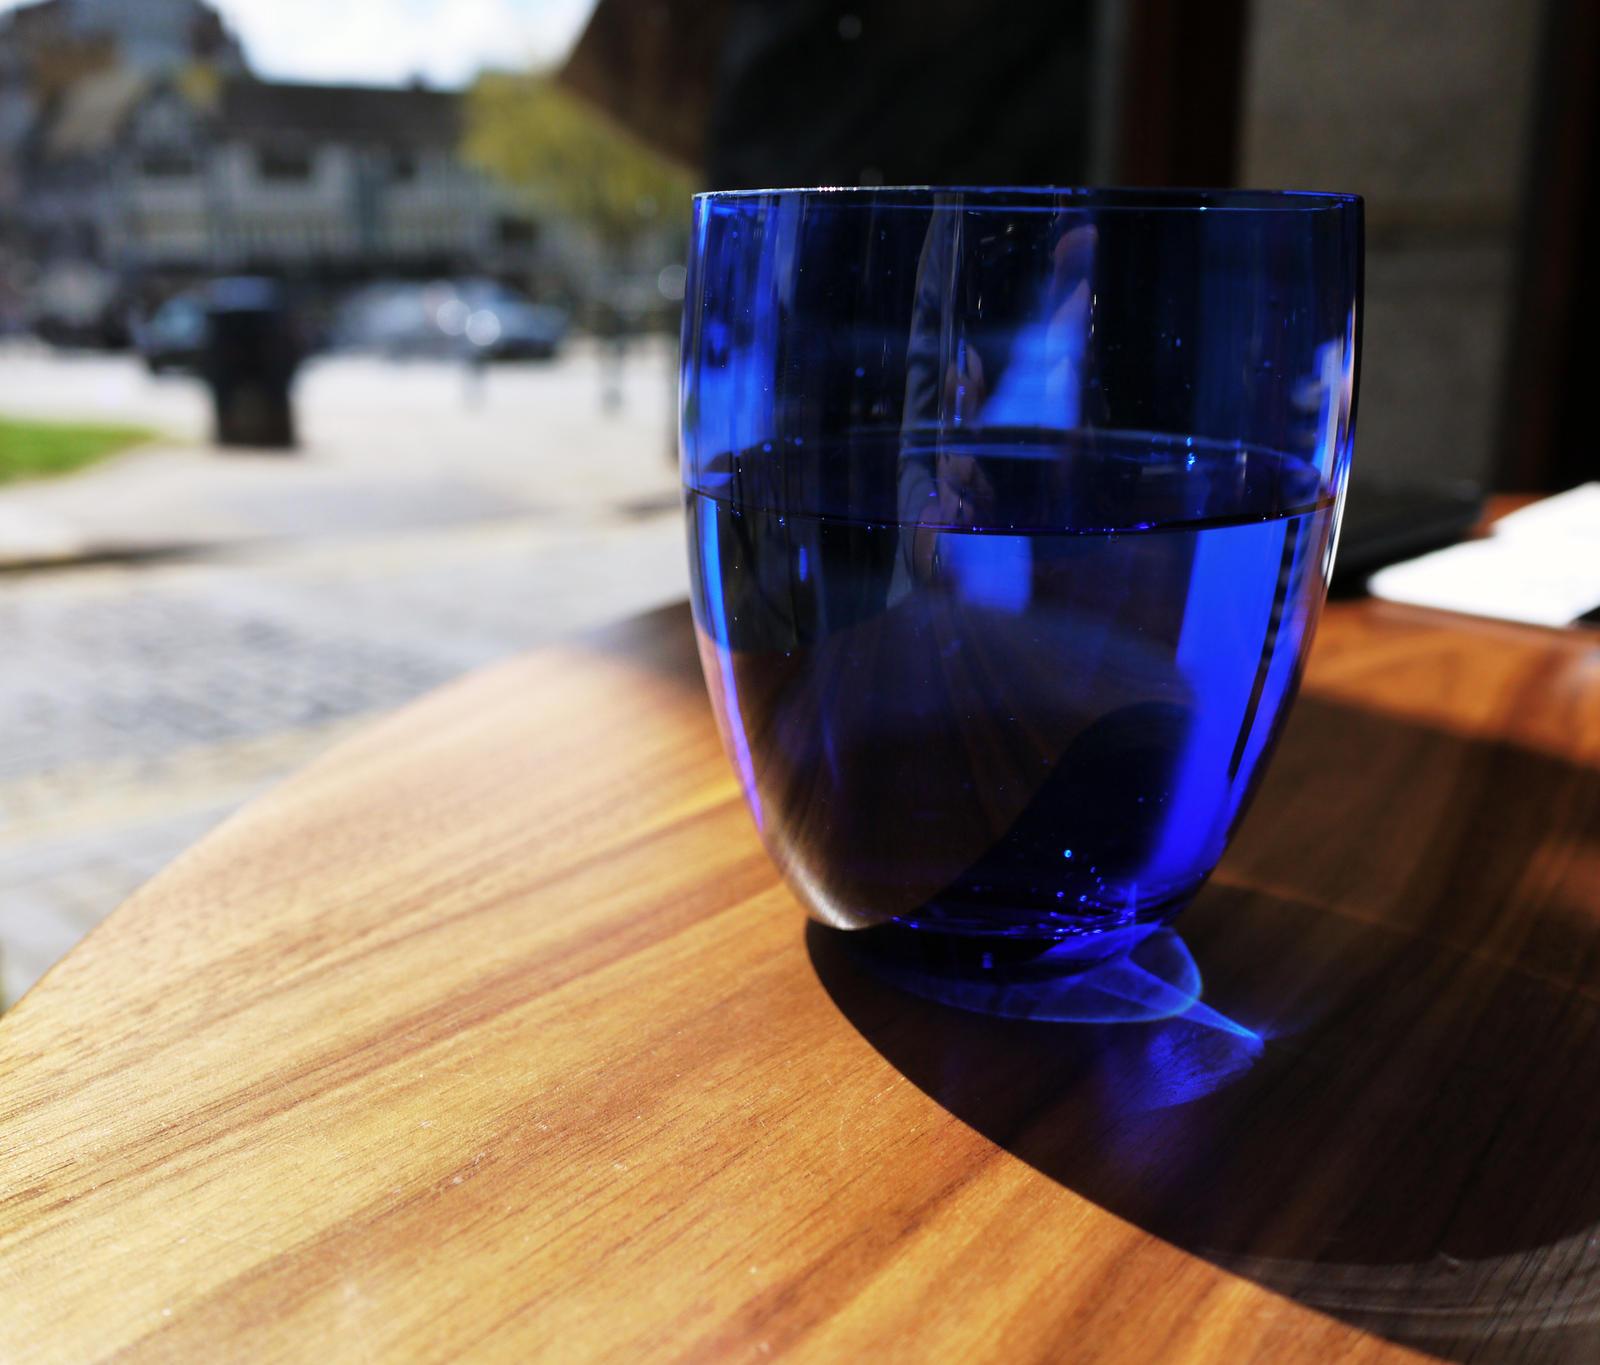 Blue glass by Ginkoftw